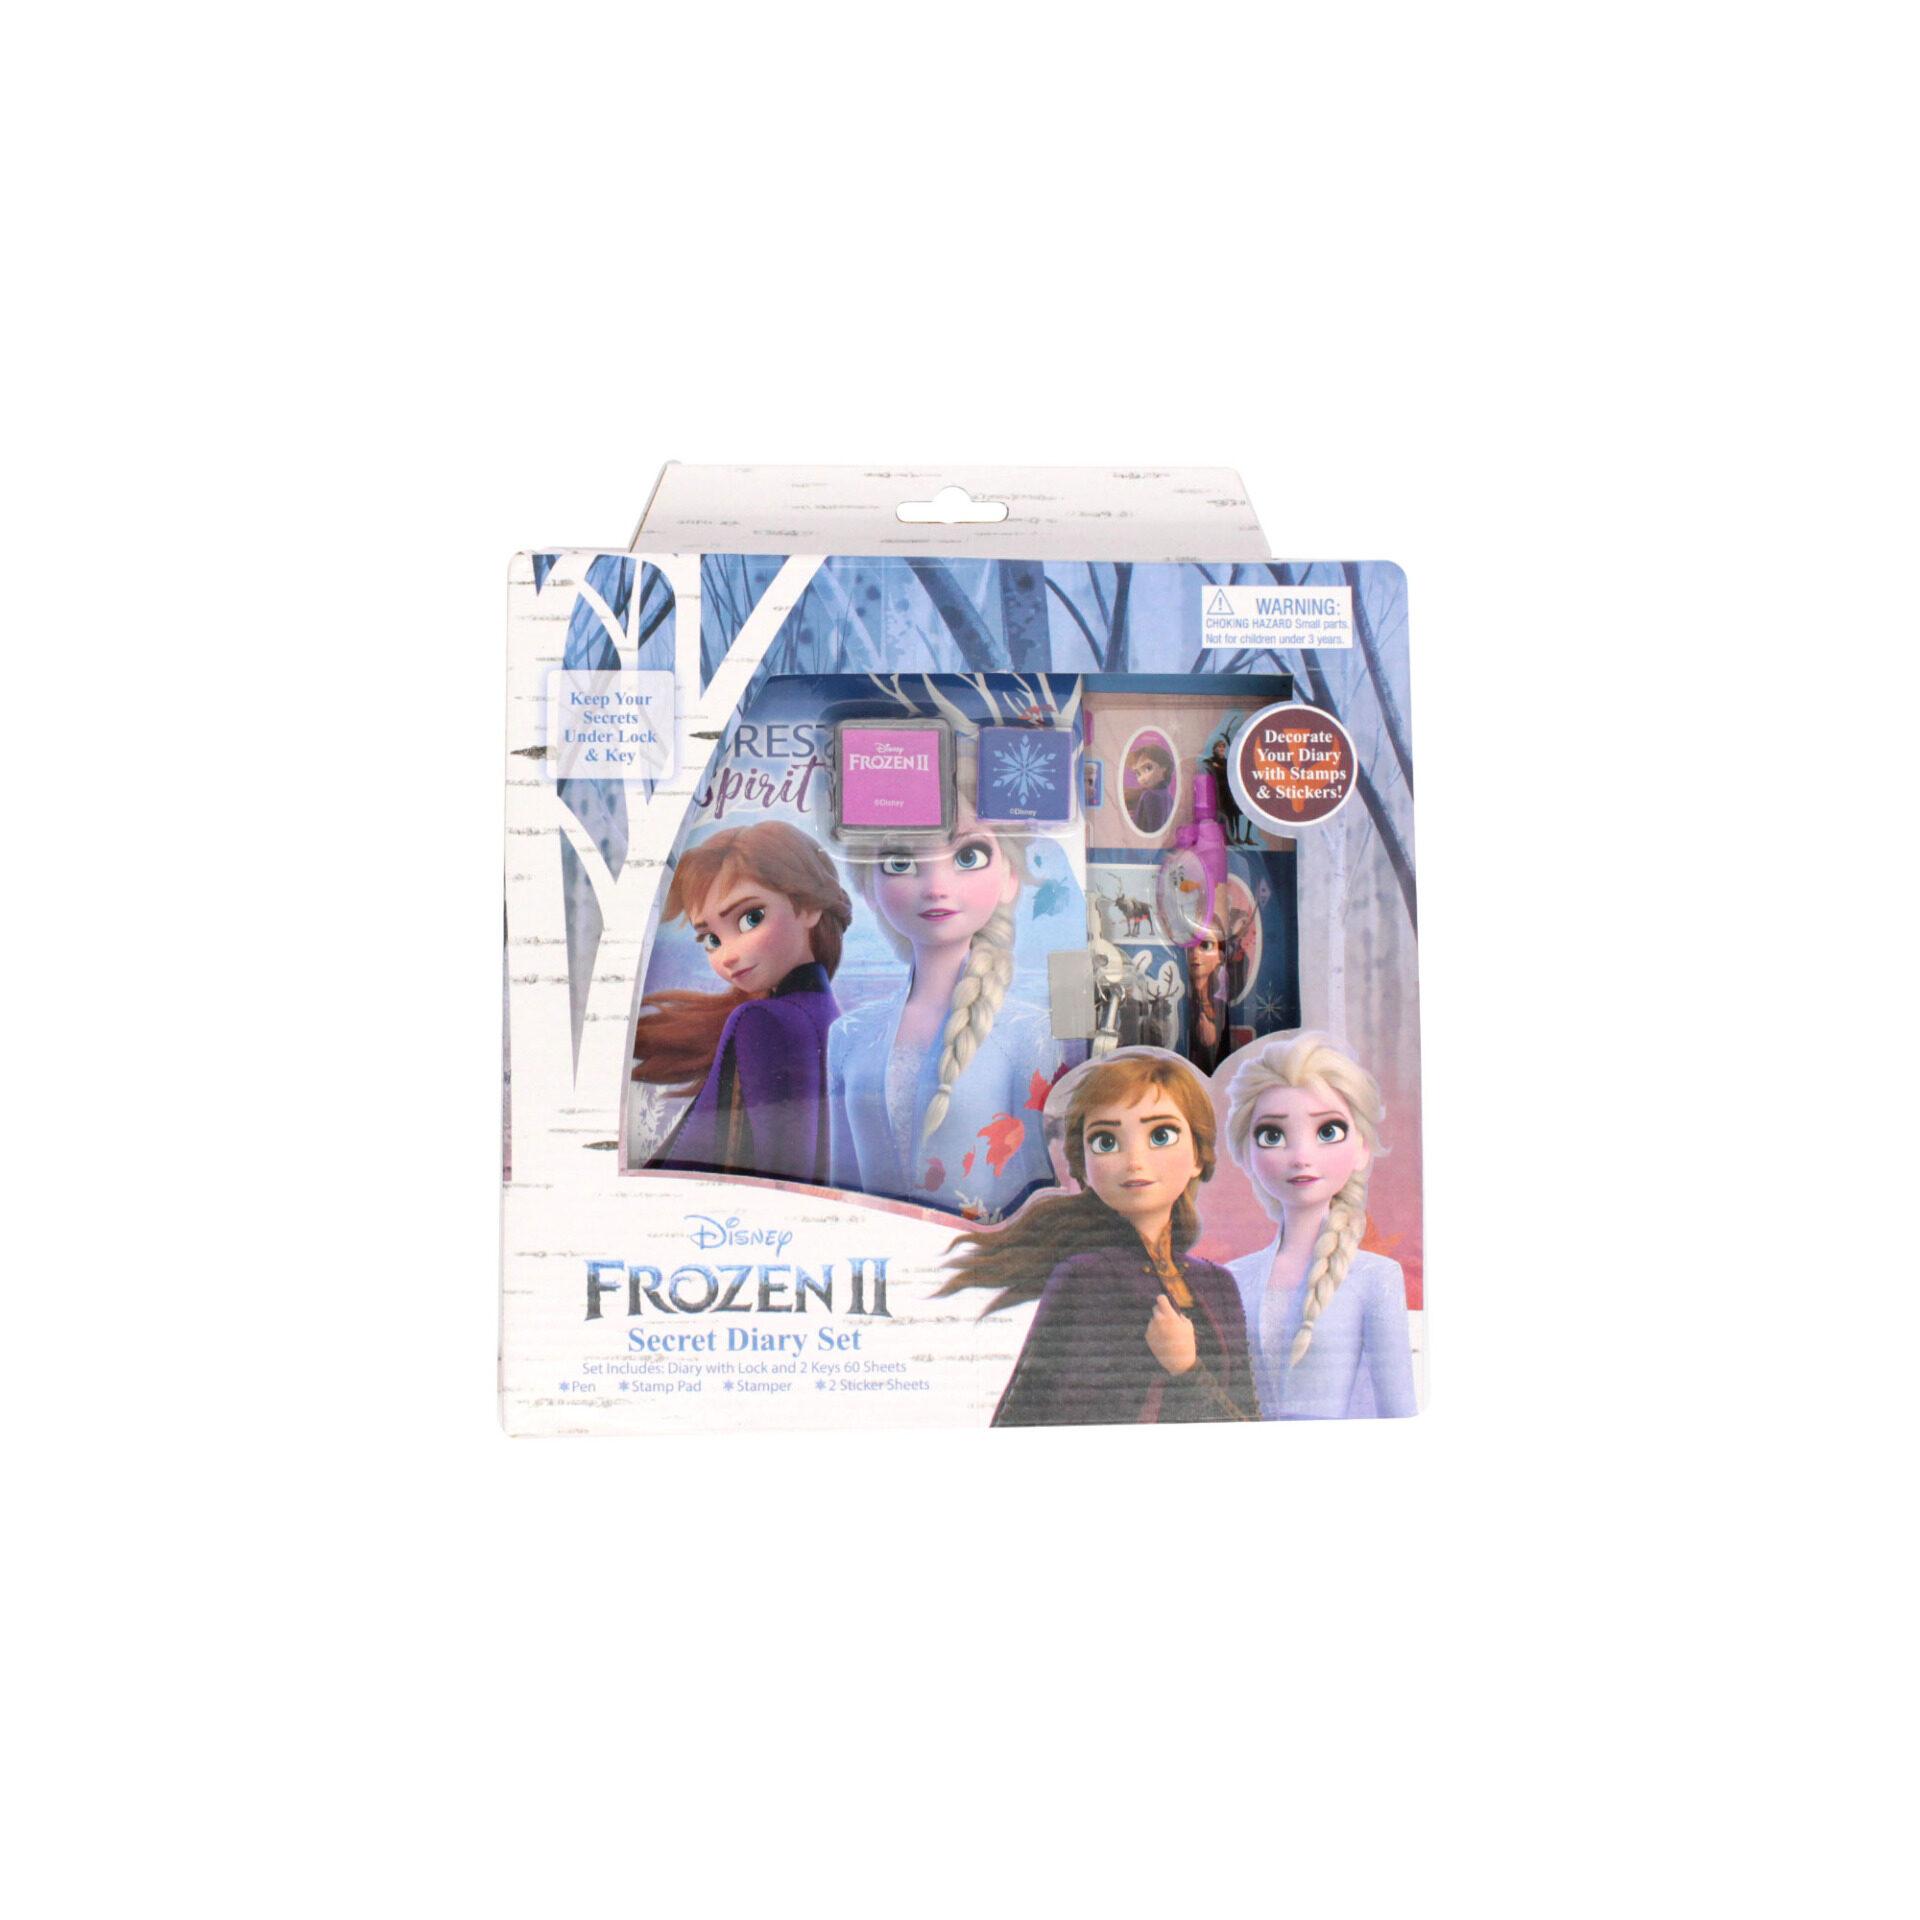 Disney Frozen 2 Princess Elsa & Anna Secret Diary Set With Lock & 2 Keys Pen Stamp Pad Stamper & 2 Sticker Sheets For Girls